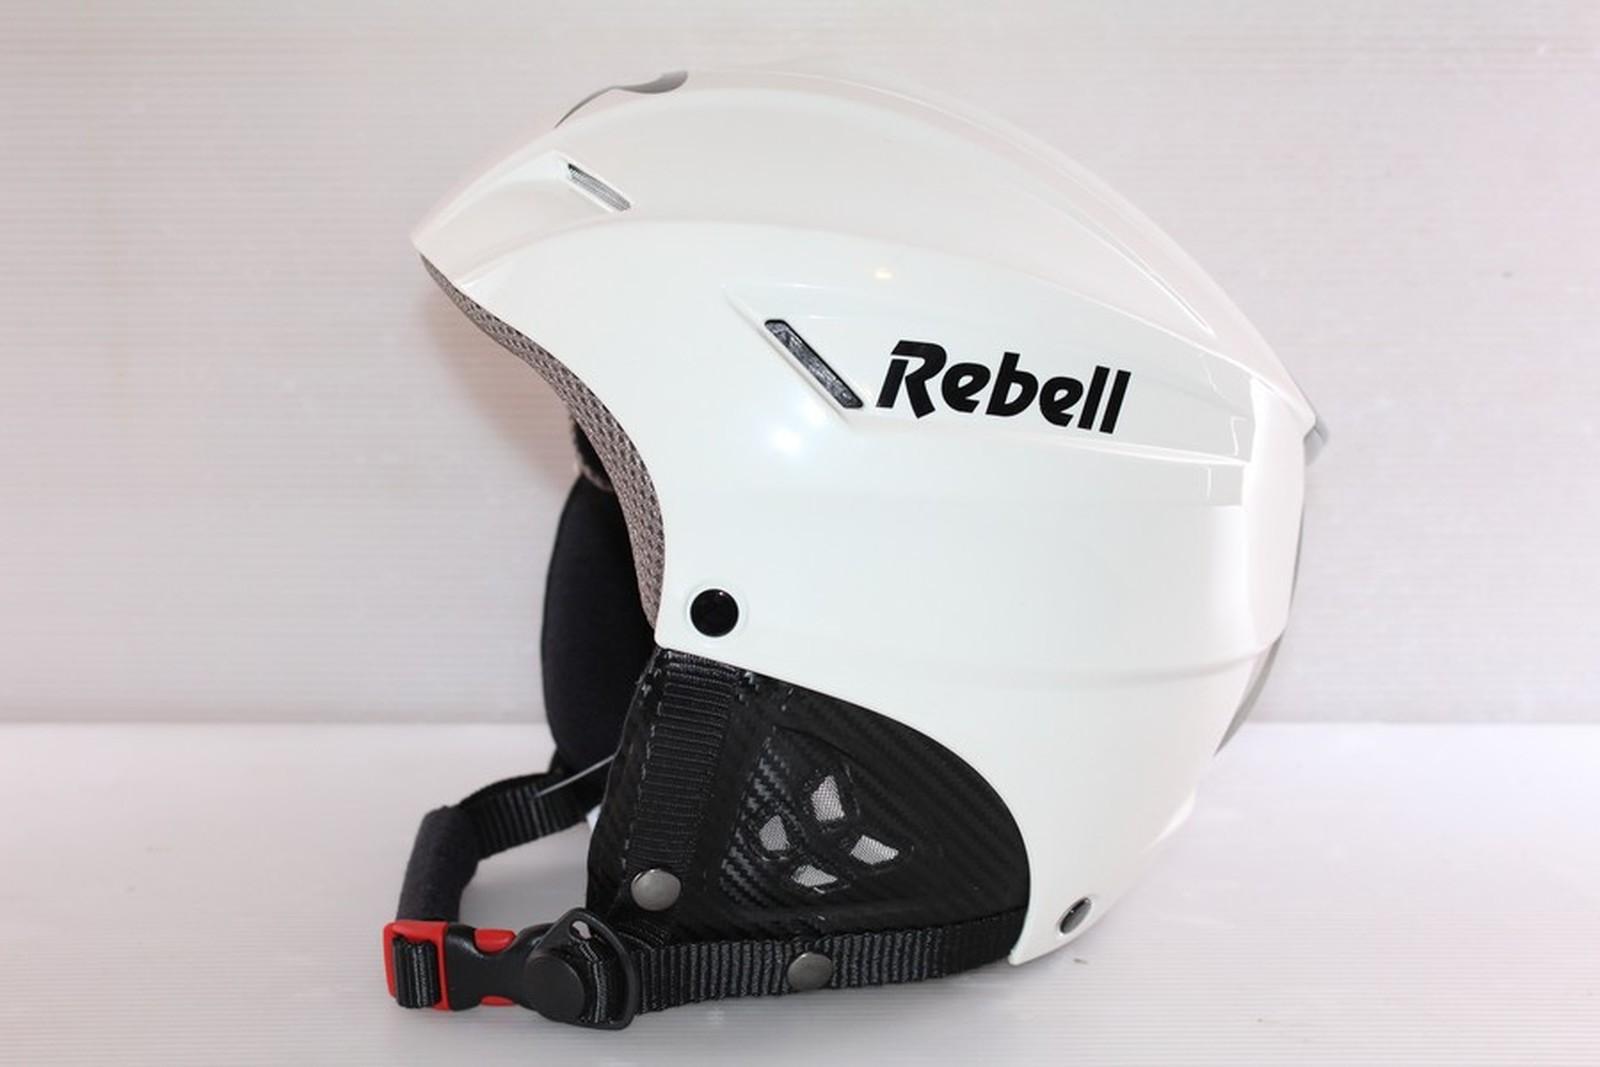 Lyžařská helma Rebell Rebell vel. 61